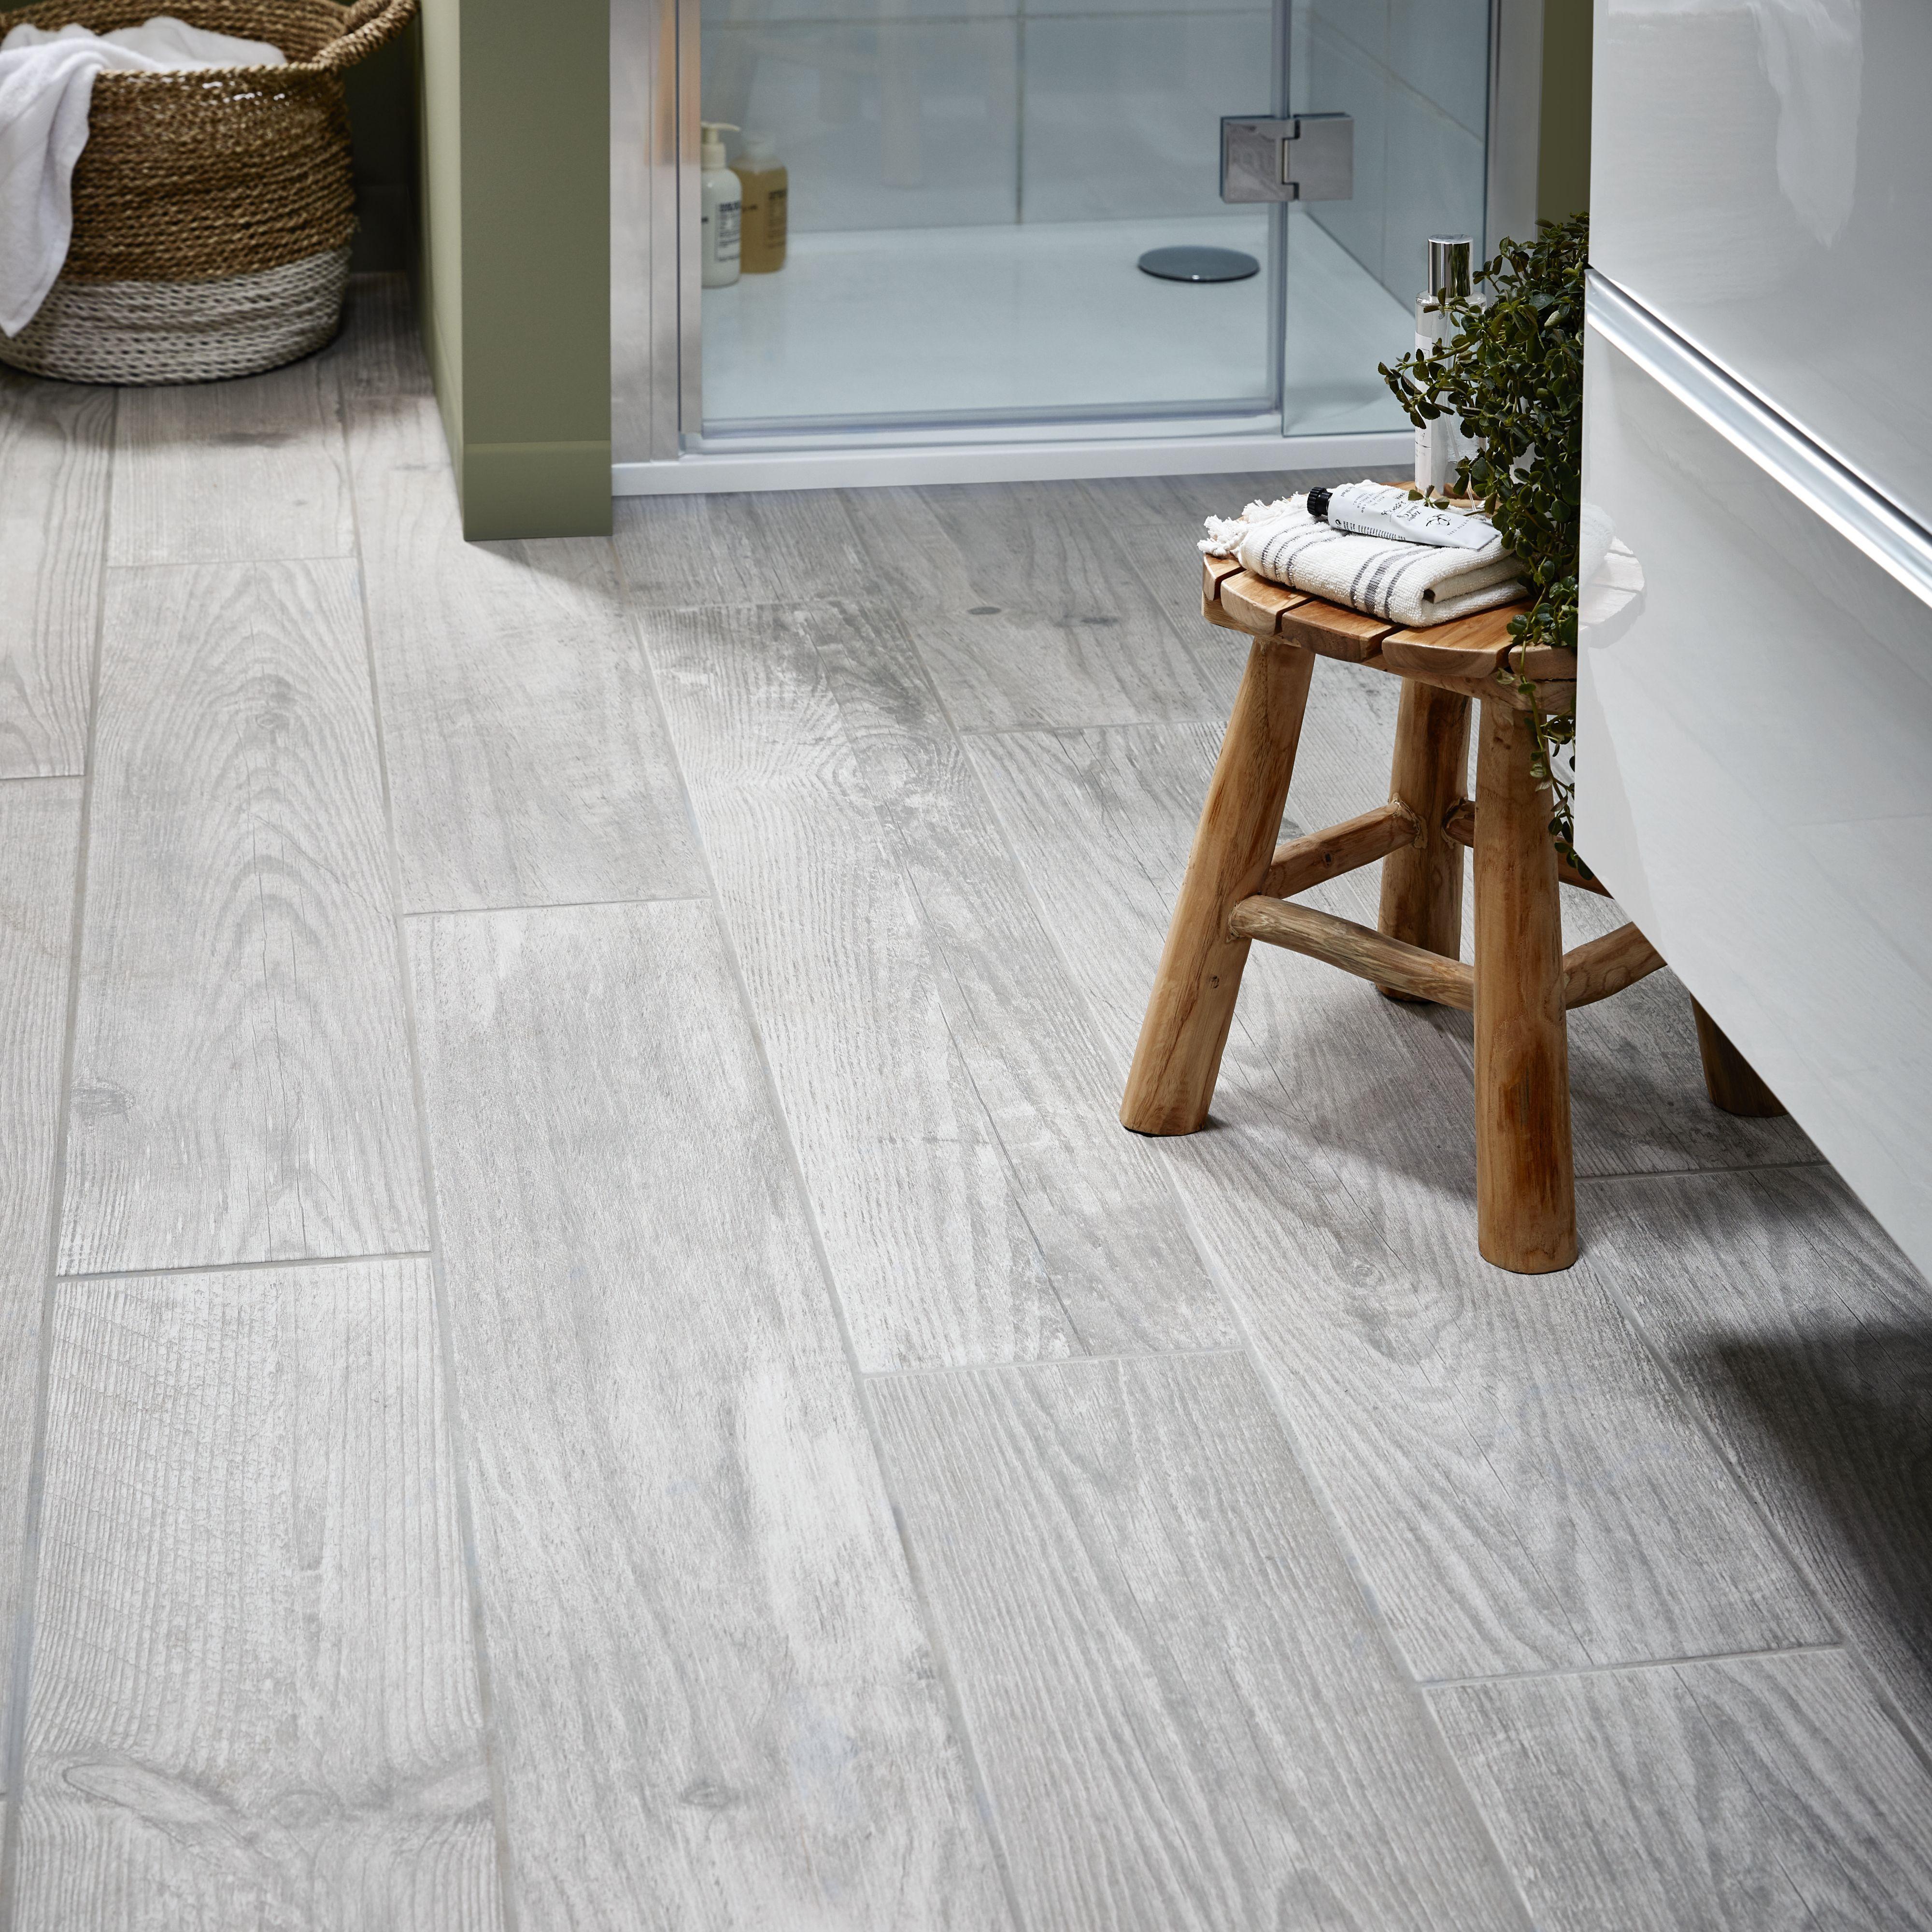 Cotage Wood Grey Matt Wood Effect Porcelain Floor Tile Pack Of 4 L 1200mm W 200mm Porcelain Flooring Porcelain Floor Tiles Tile Floor Diy